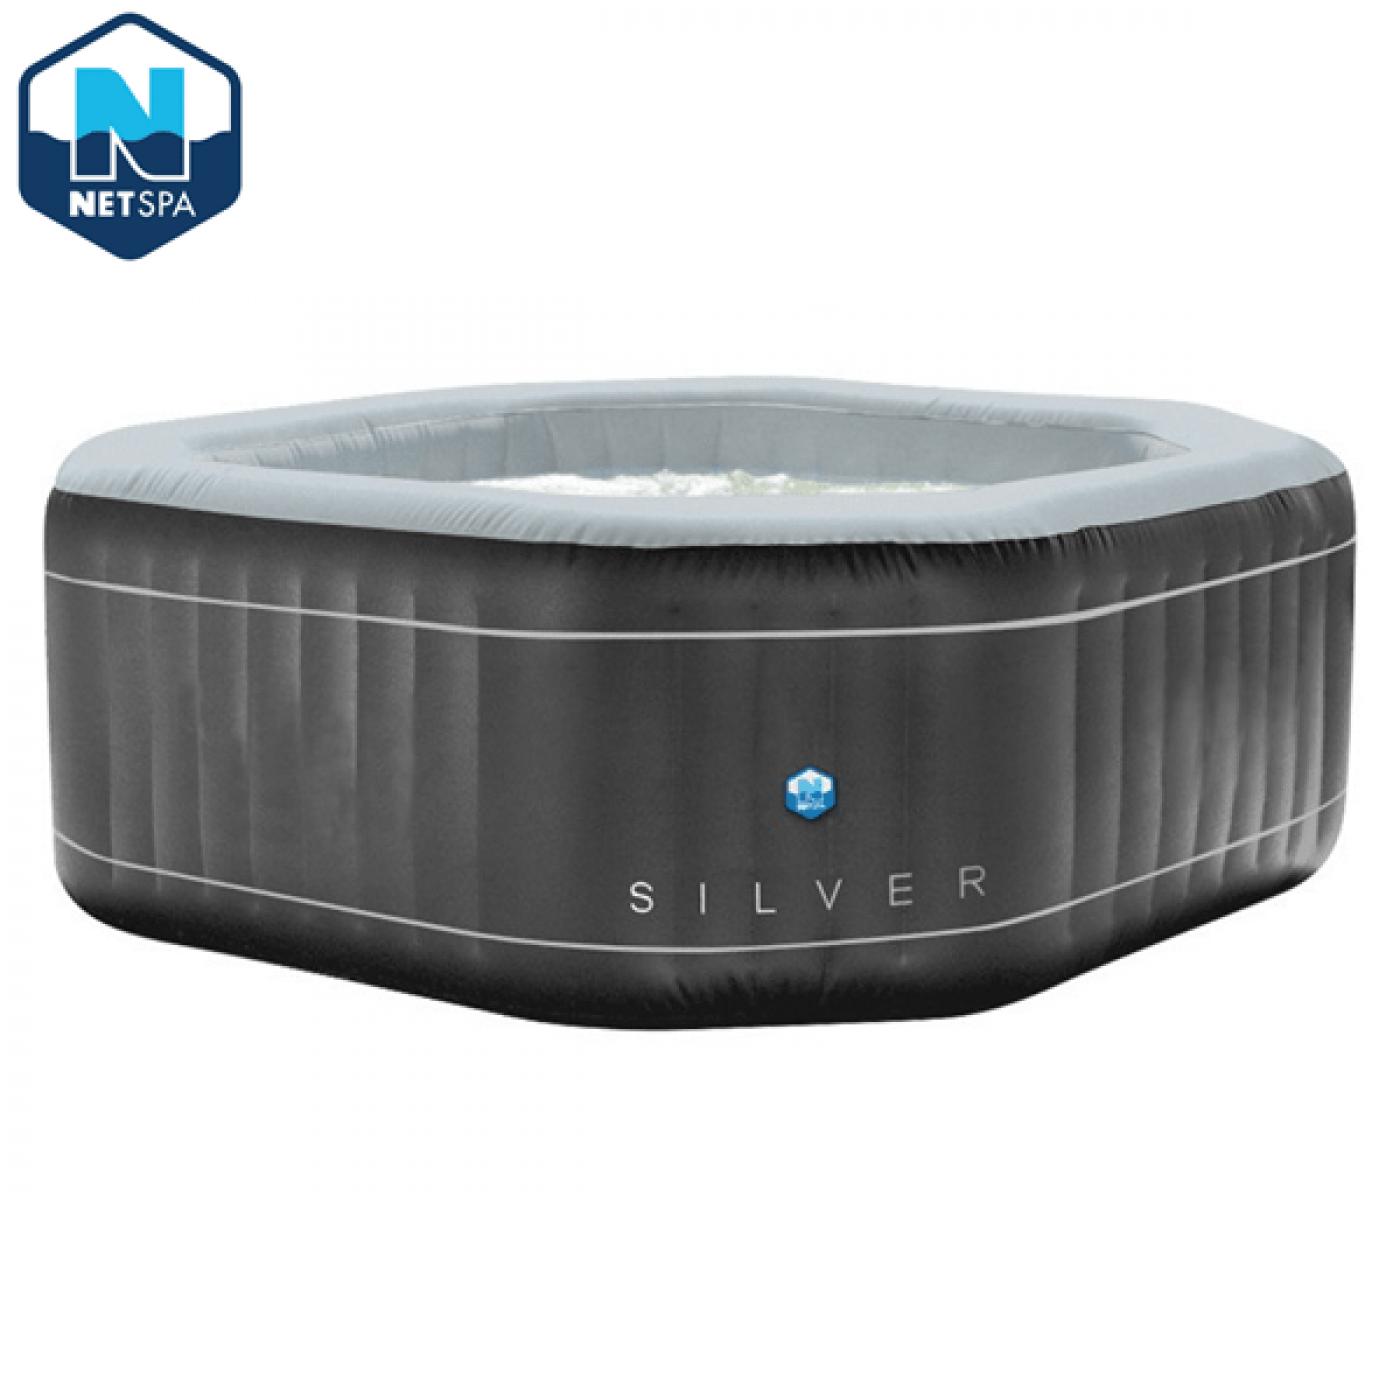 Piscina idromassaggio gonfiabile 5/6 Posti 195x195 Silver NETSPA